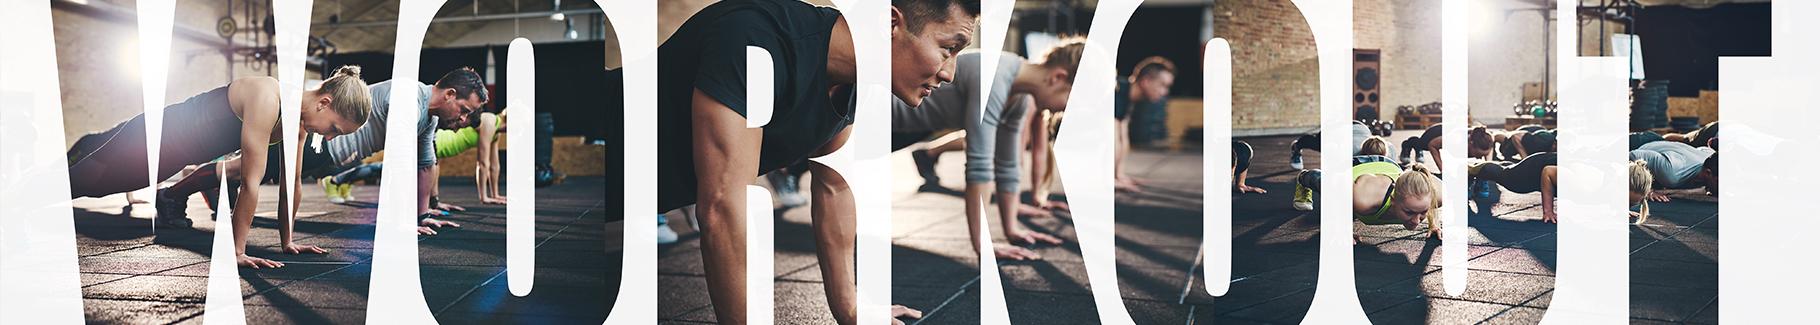 Fototapeta do siłowni – Workout